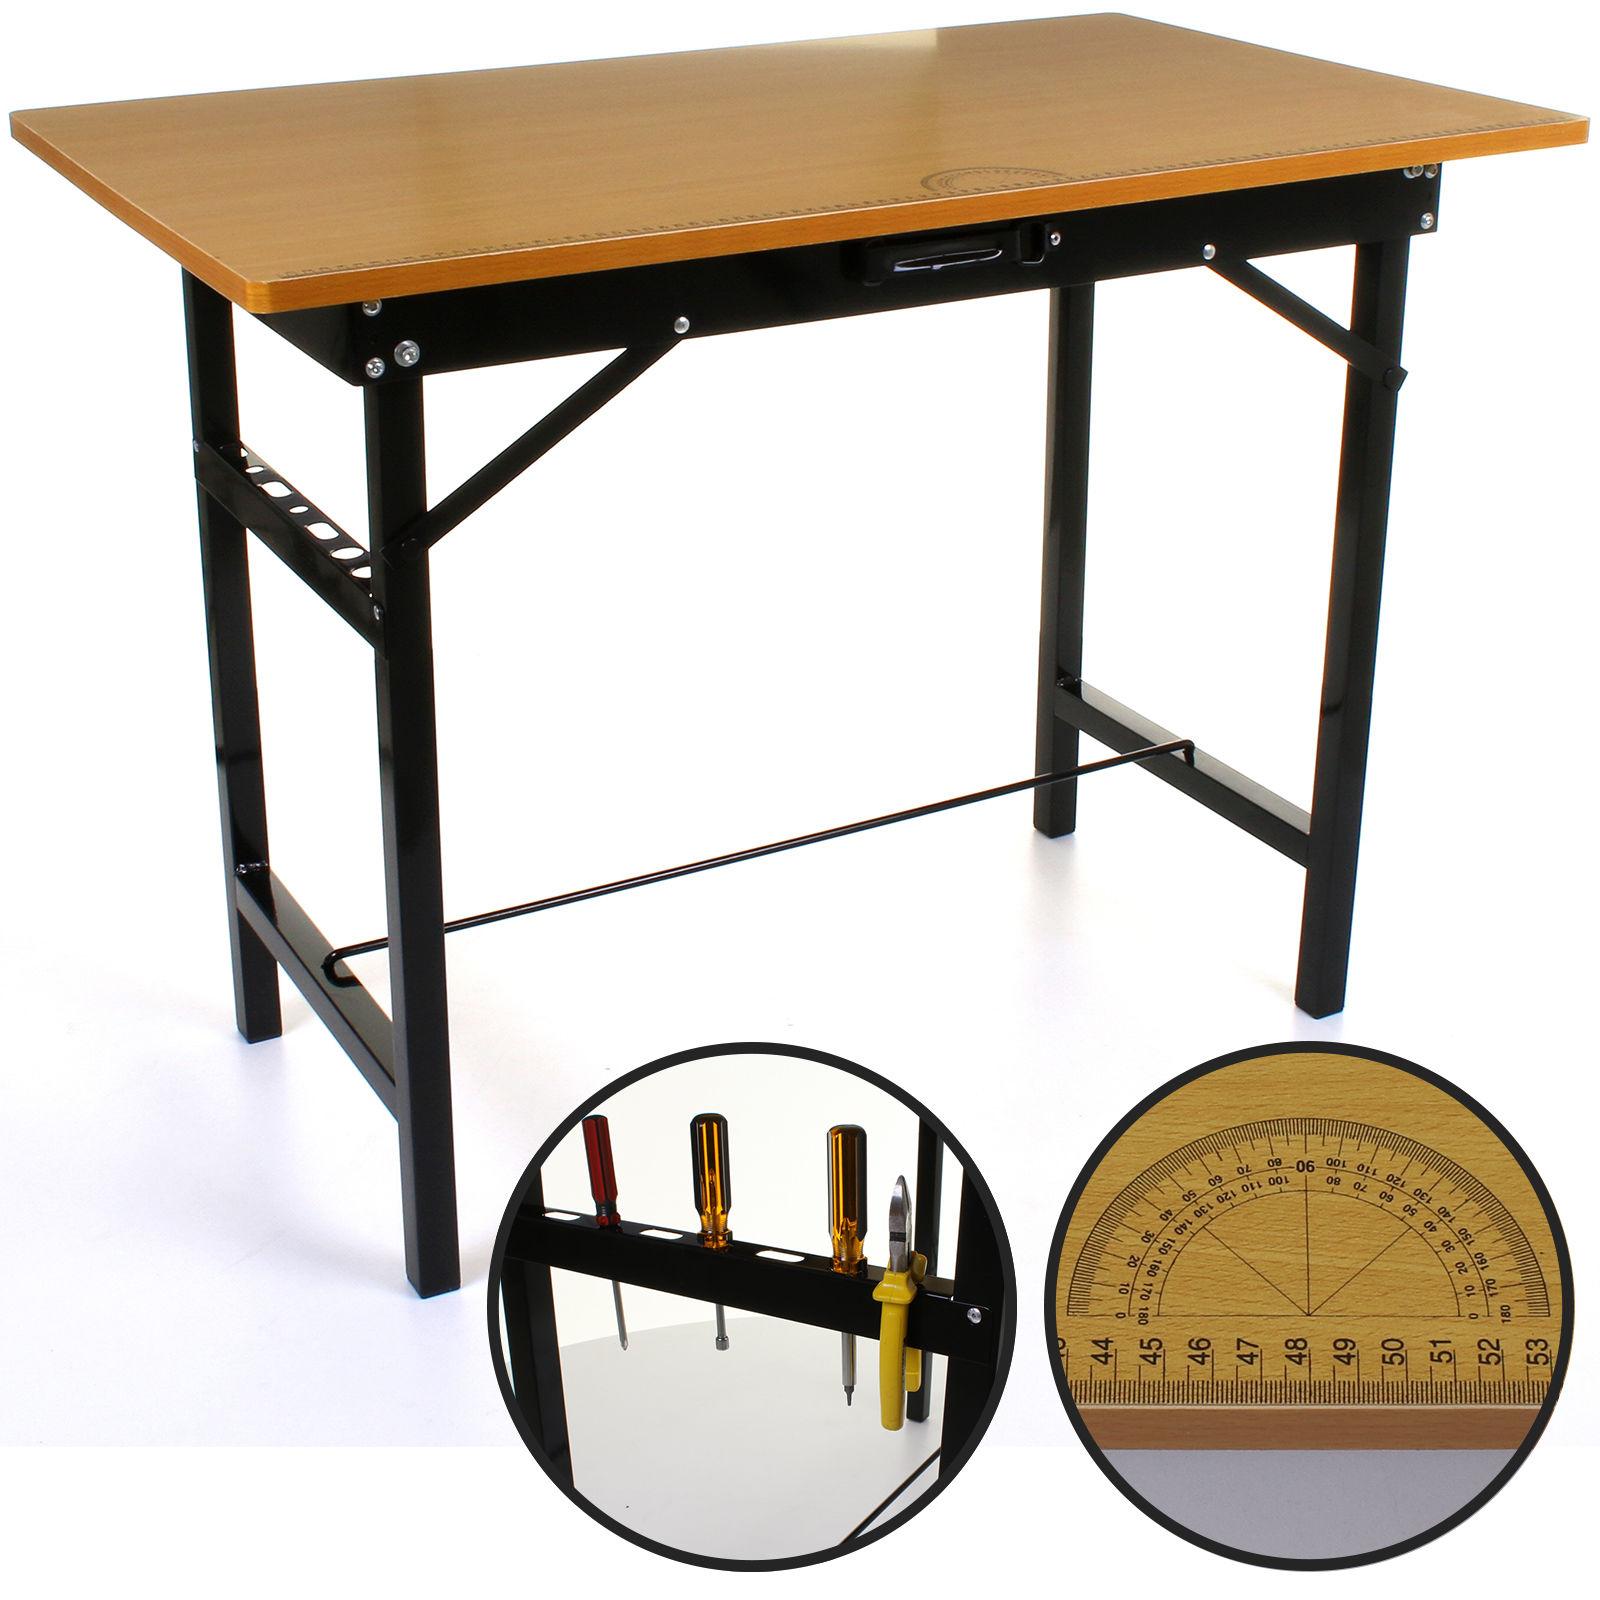 150kg Heavy Duty Portable Folding Workbench Pasting Table Work Bench Foldable 5055493840799 Ebay